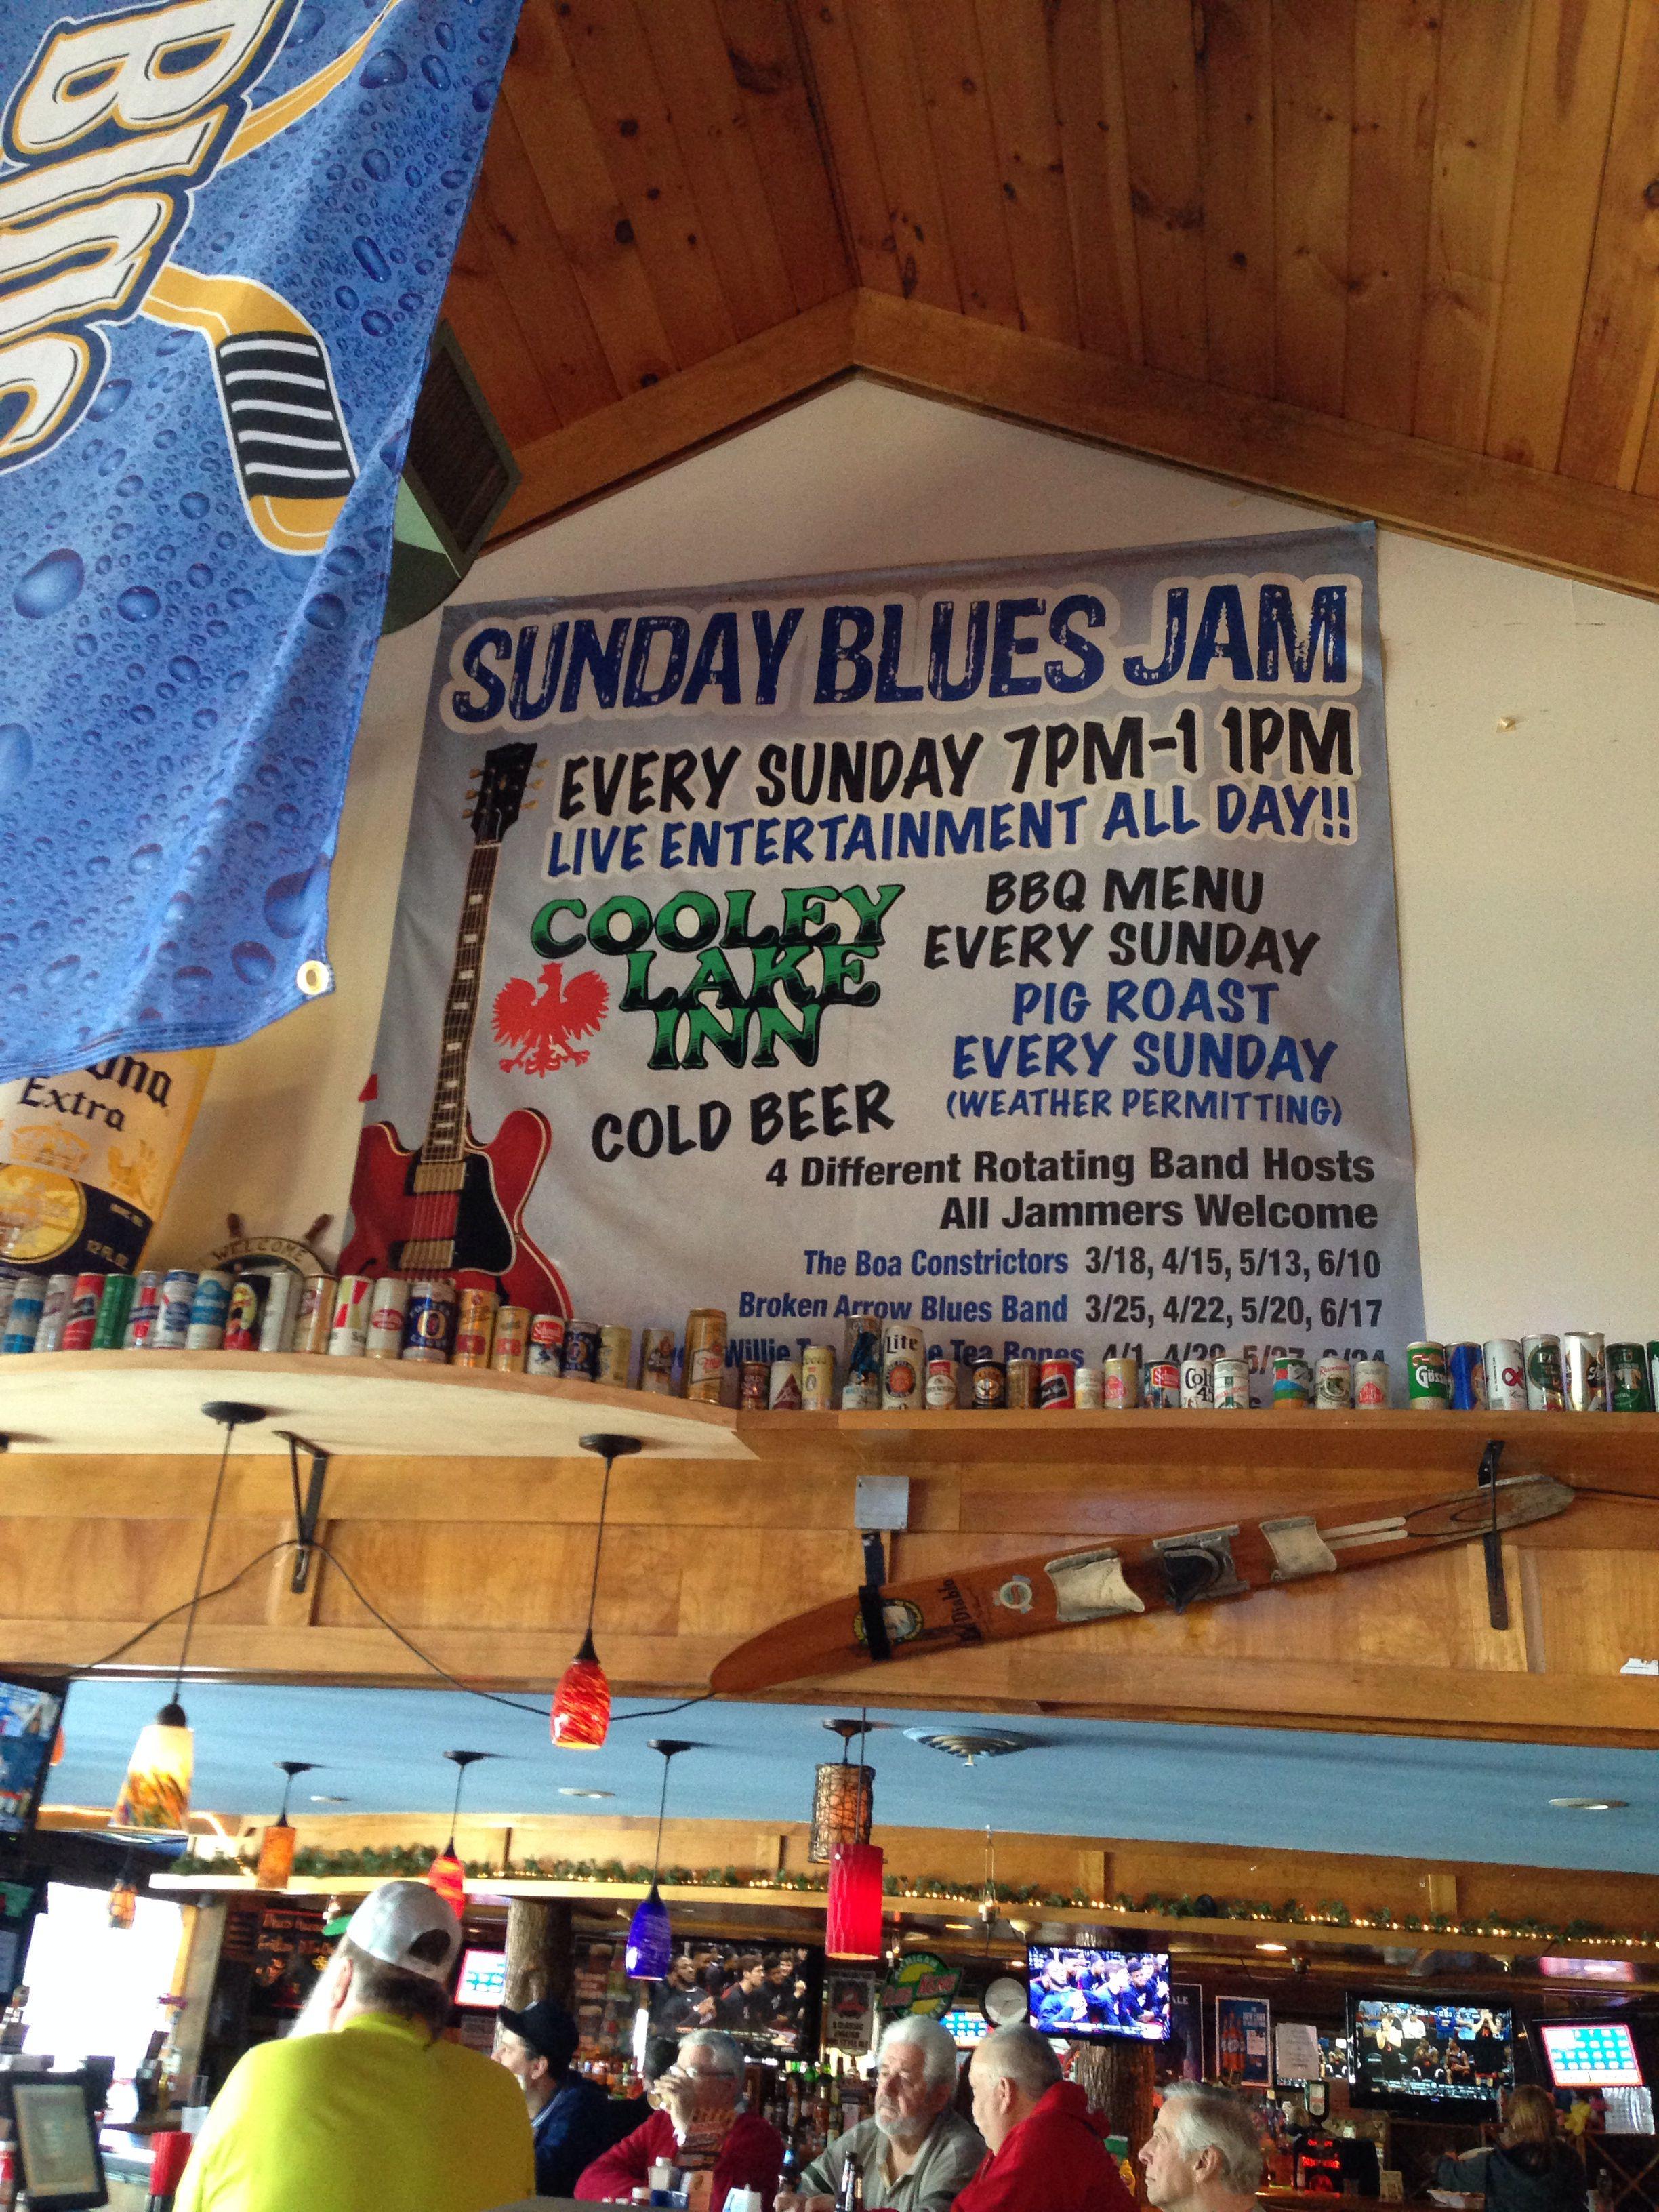 Cooley lake inn michigan bbq menu blue jam live